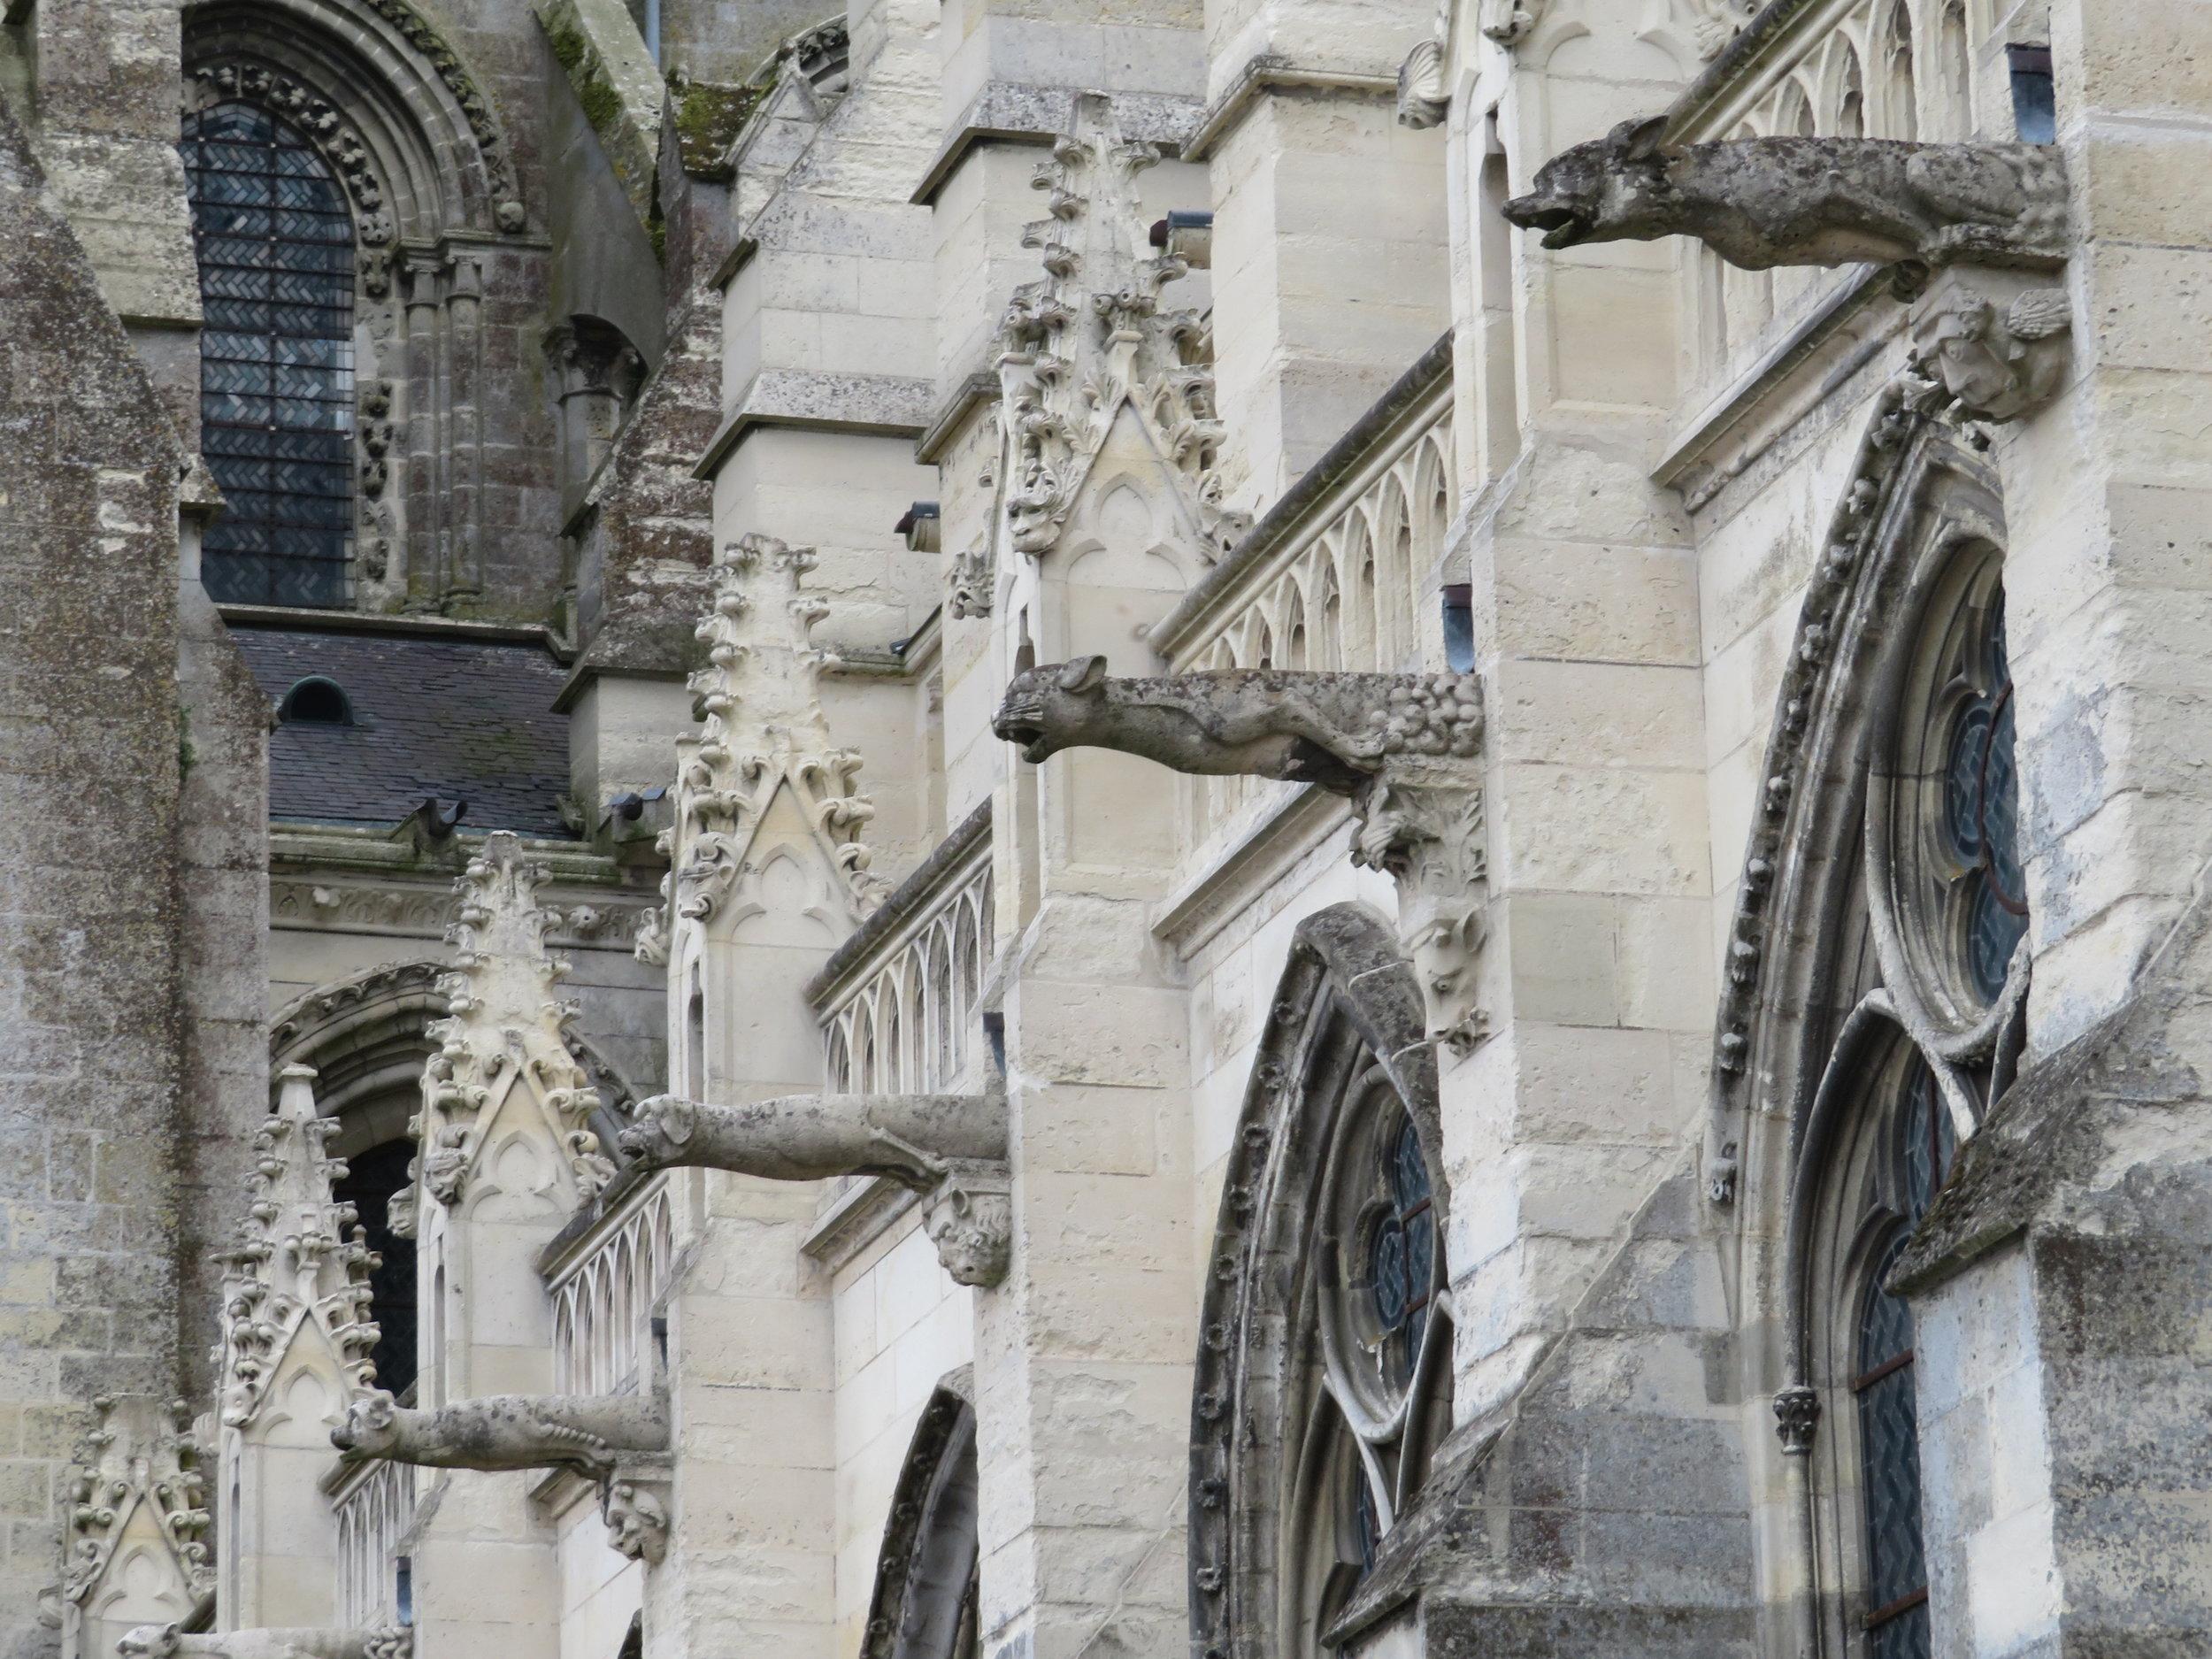 laon_cathedrals_gargoyles.JPG